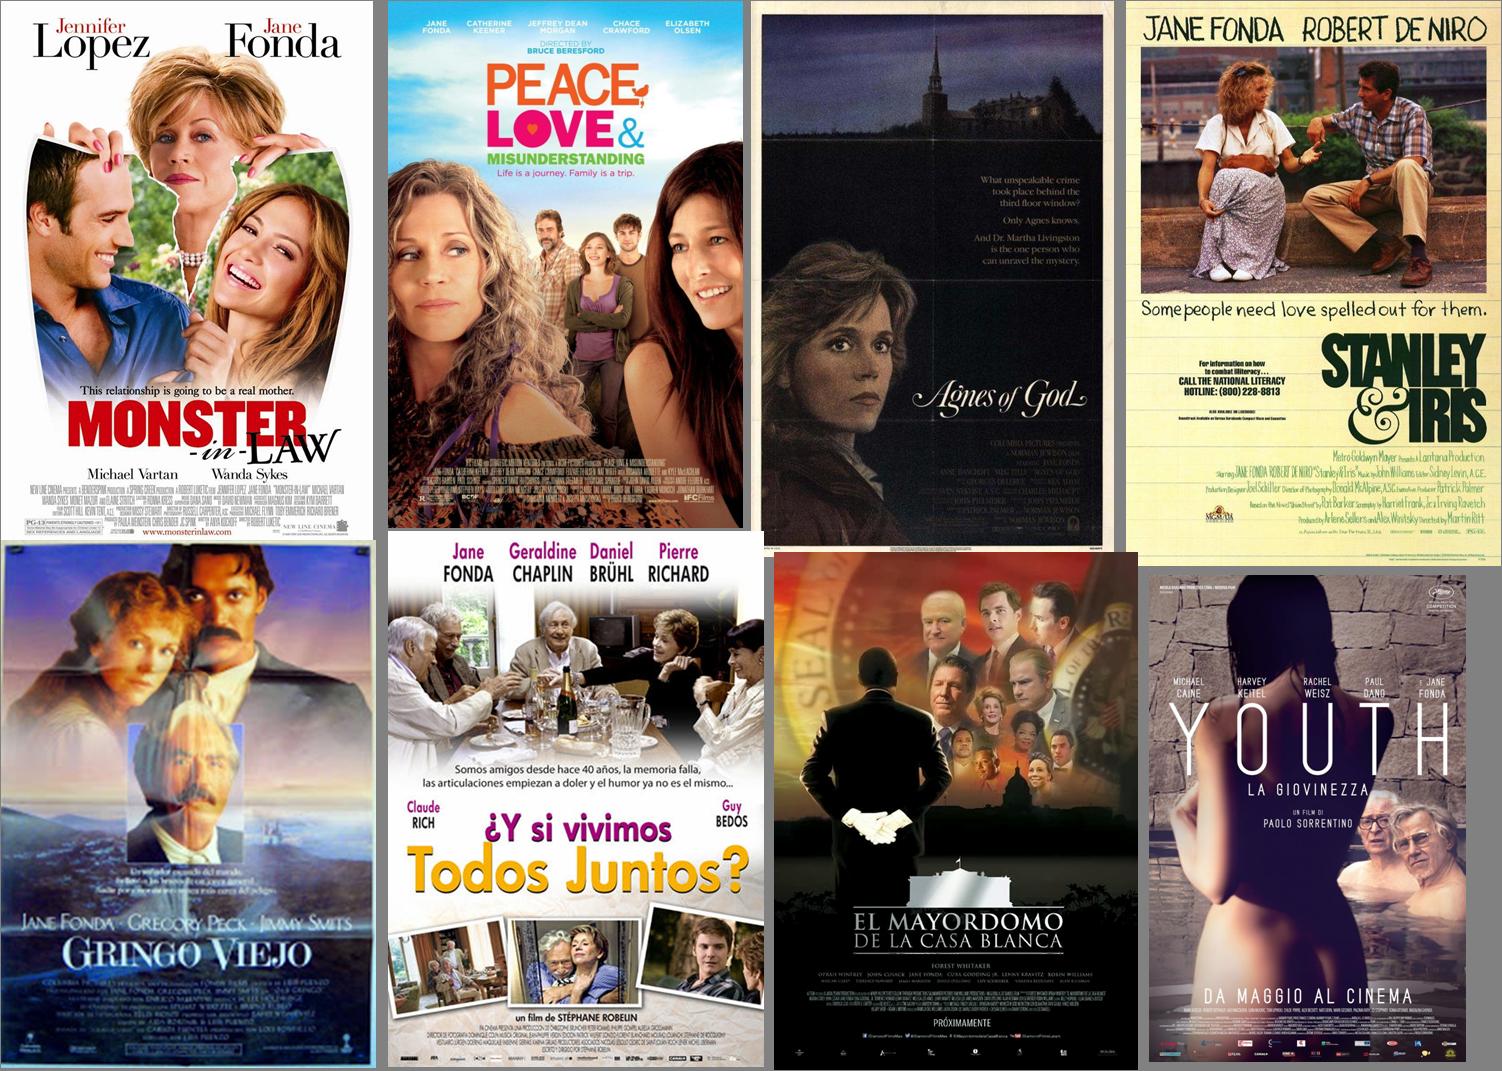 Jane Fonda afiches 3